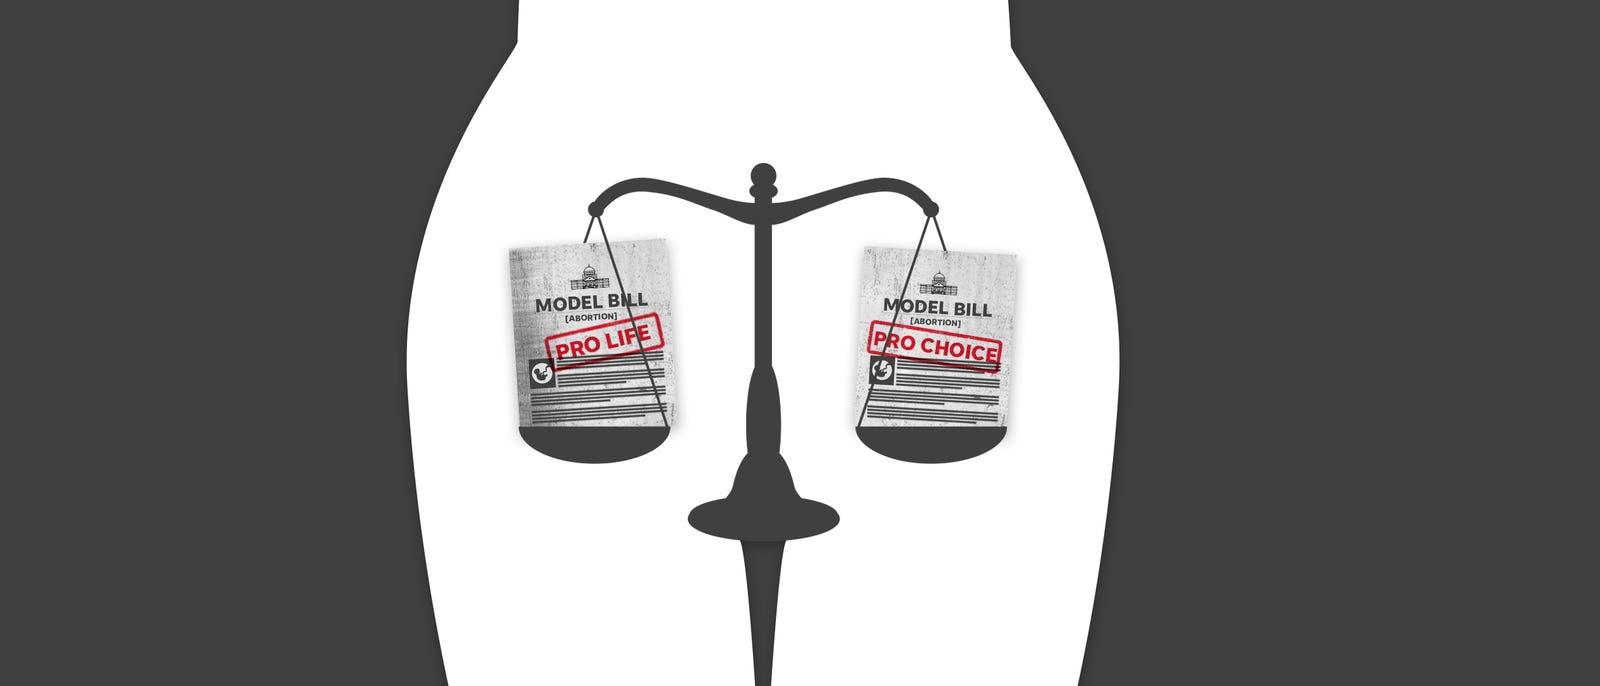 https://www.gannett-cdn.com/presto/2019/06/19/USAT/cb088616-c8d0-4318-afc4-53c0df8b3a64-statehouses_abortion_sidebar.jpg